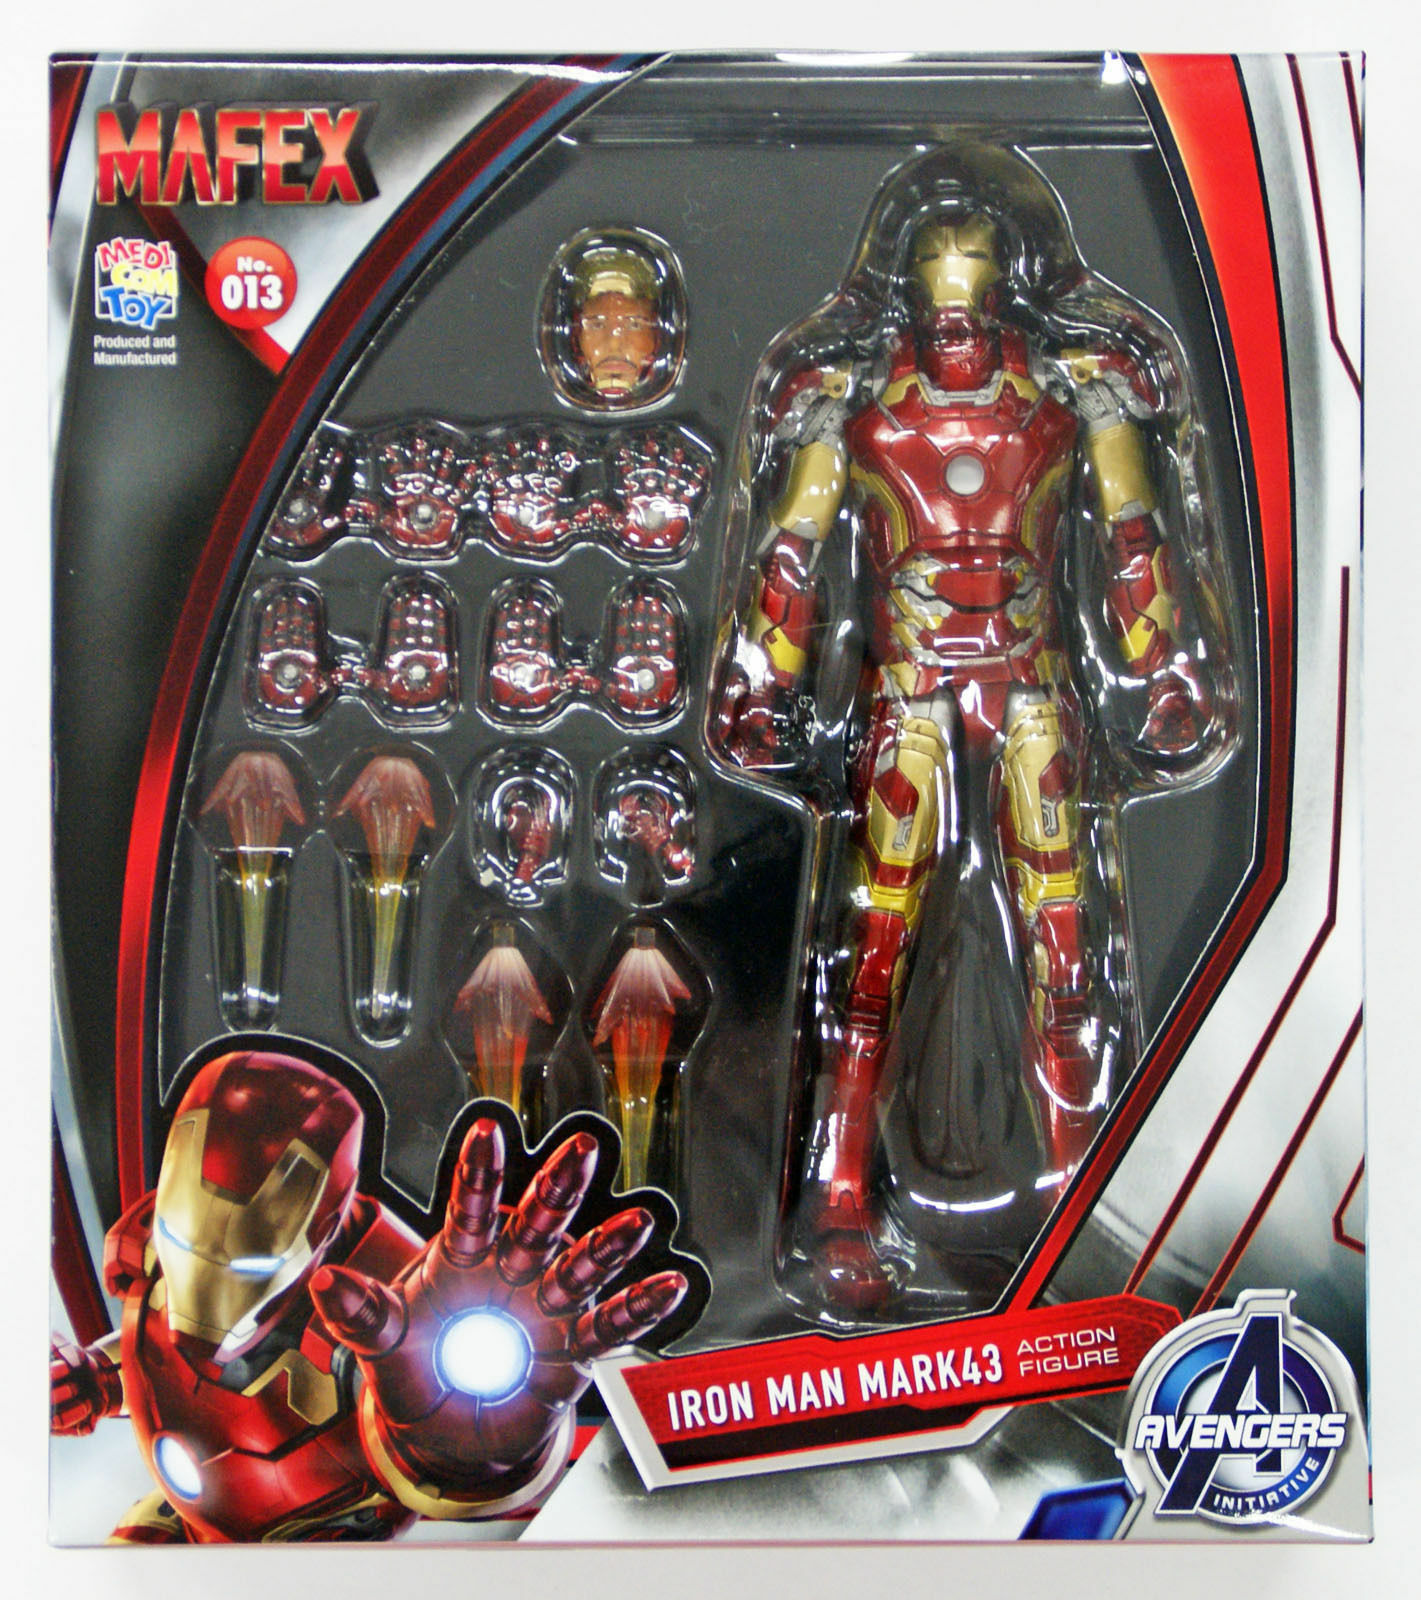 Medicom MAFEX 013 IRON uomo MARK 43 Marvel Avengers Avengers Avengers Age of Ultron 4530956470139 837766